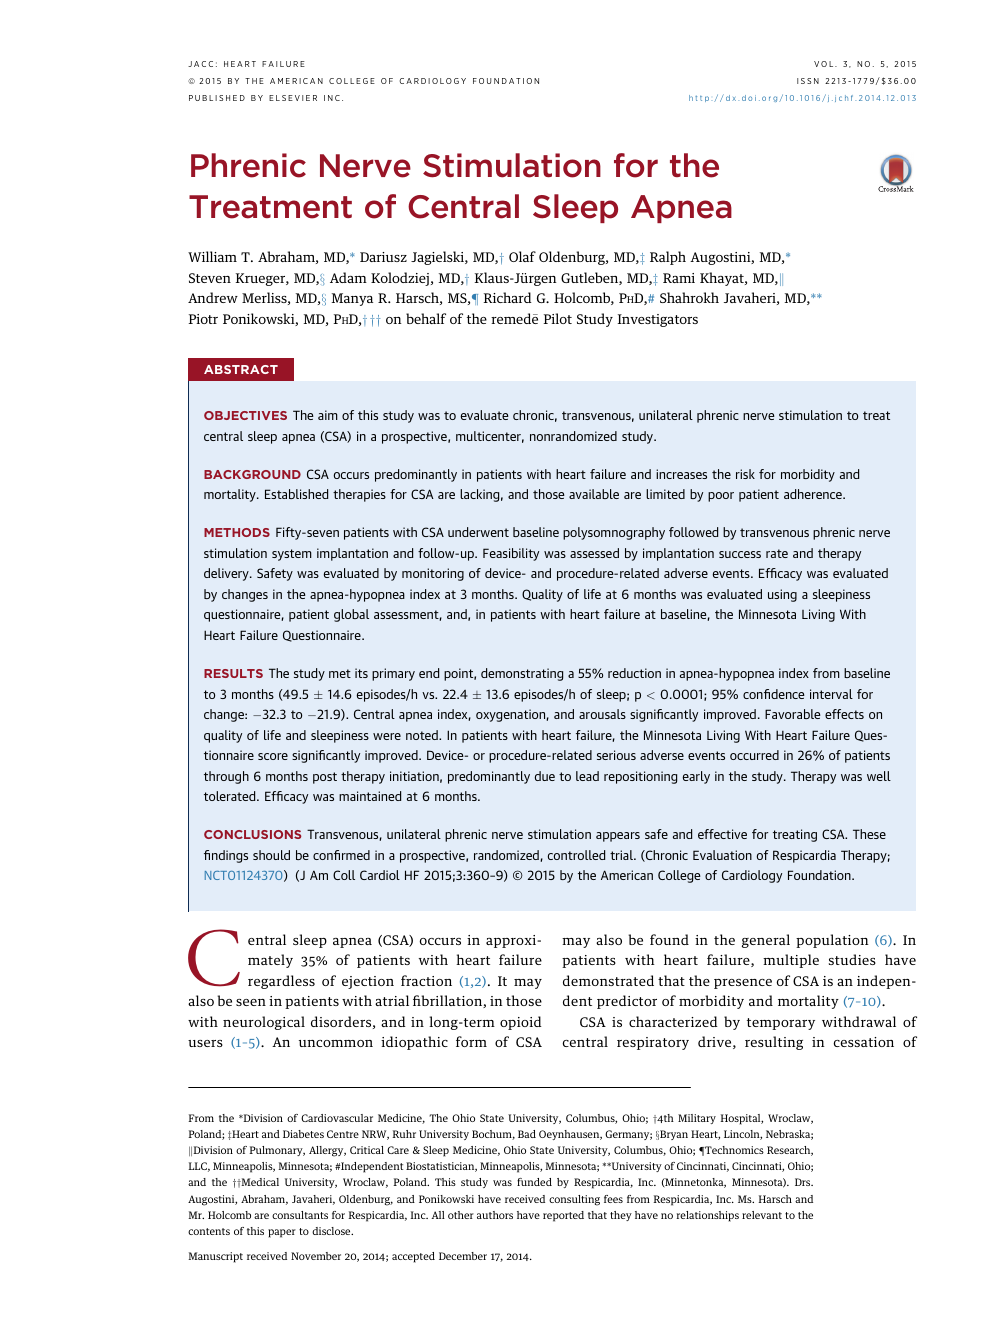 Phrenic Nerve Stimulation for the Treatment of Central Sleep